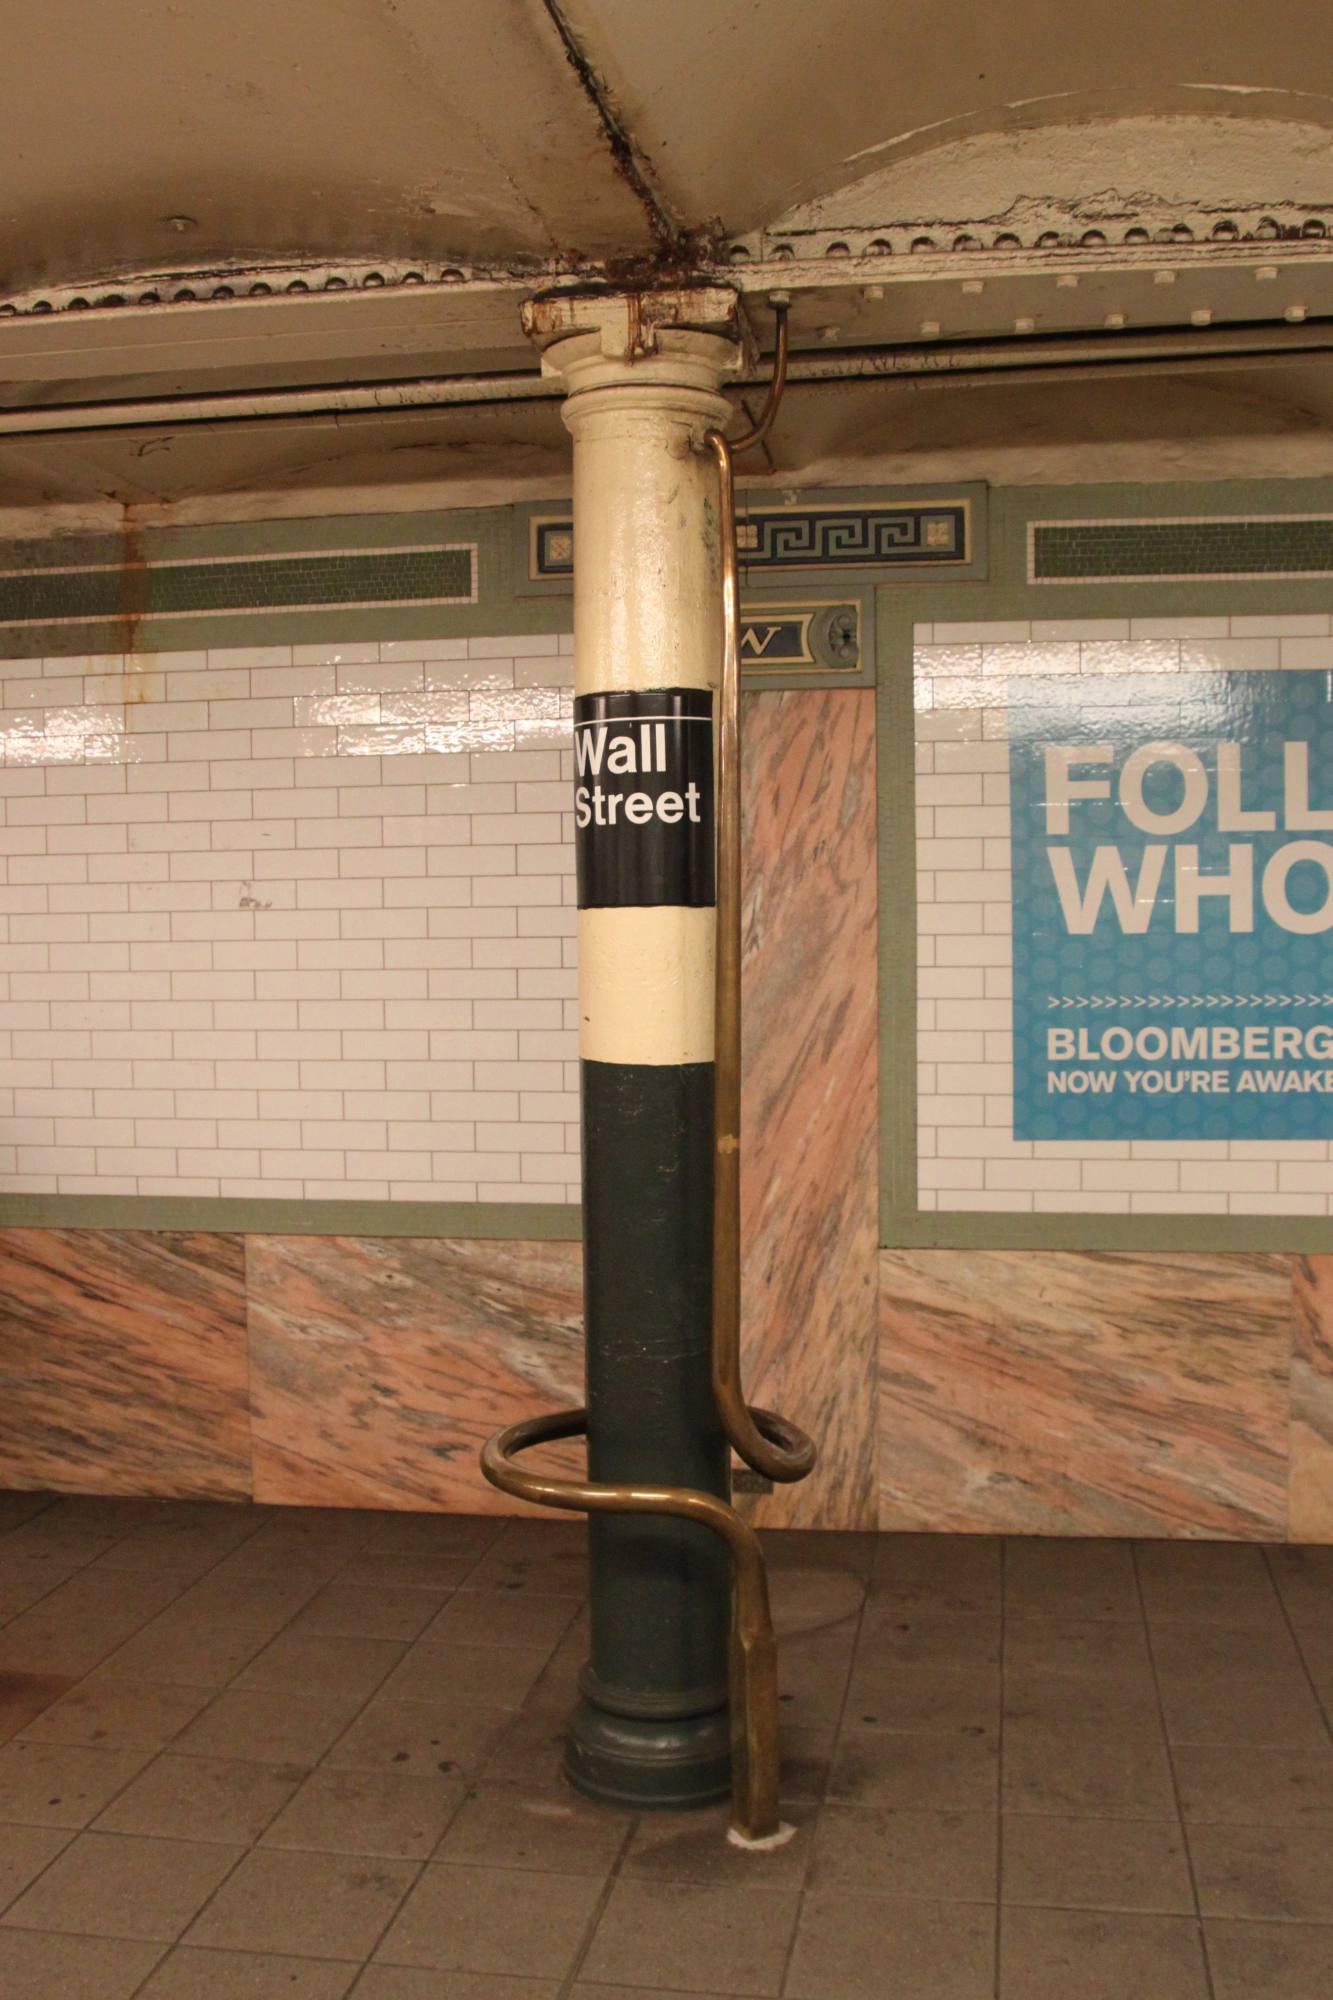 (241k, 1333x2000)<br><b>Country:</b> United States<br><b>City:</b> New York<br><b>System:</b> New York City Transit<br><b>Line:</b> IRT East Side Line<br><b>Location:</b> Wall Street <br><b>Photo by:</b> Robbie Rosenfeld<br><b>Date:</b> 9/25/2011<br><b>Artwork:</b> <i>Lariat Seat Loops</i>, James Garvey.<br><b>Viewed (this week/total):</b> 0 / 1503